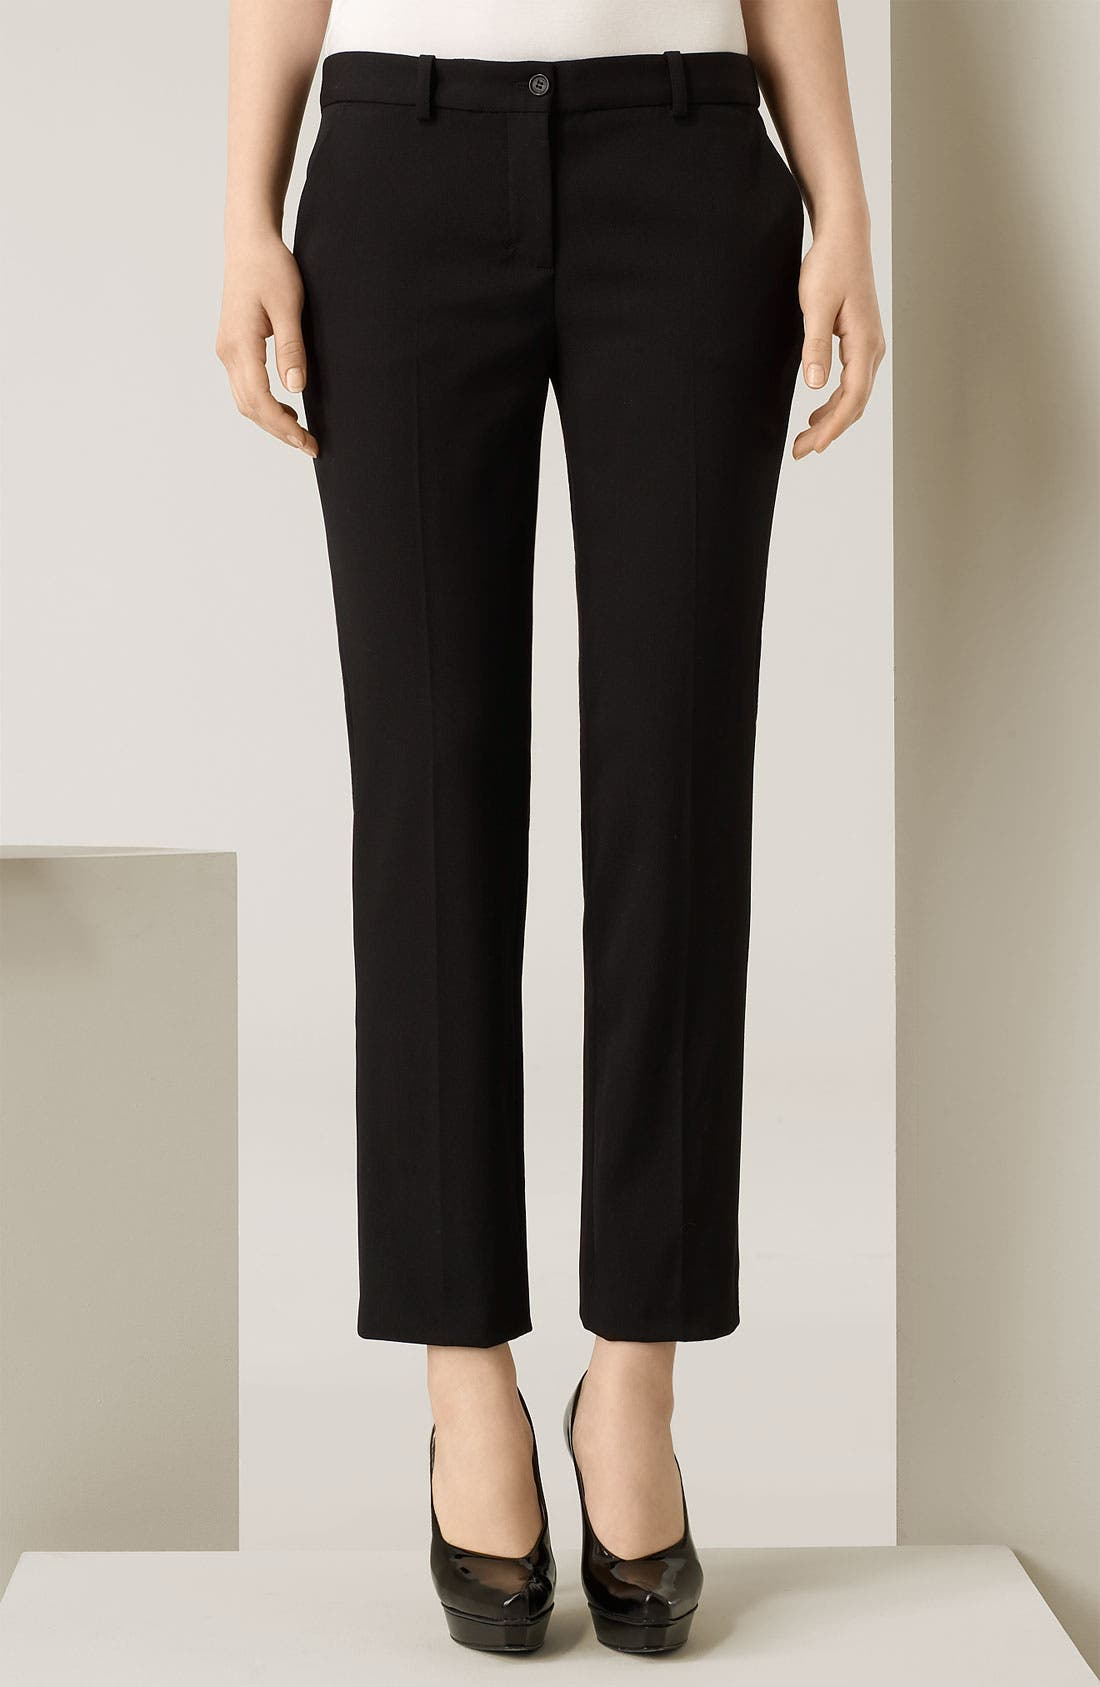 Alternate Image 1 Selected - Michael Kors Cotton Broadcloth Capri Pants